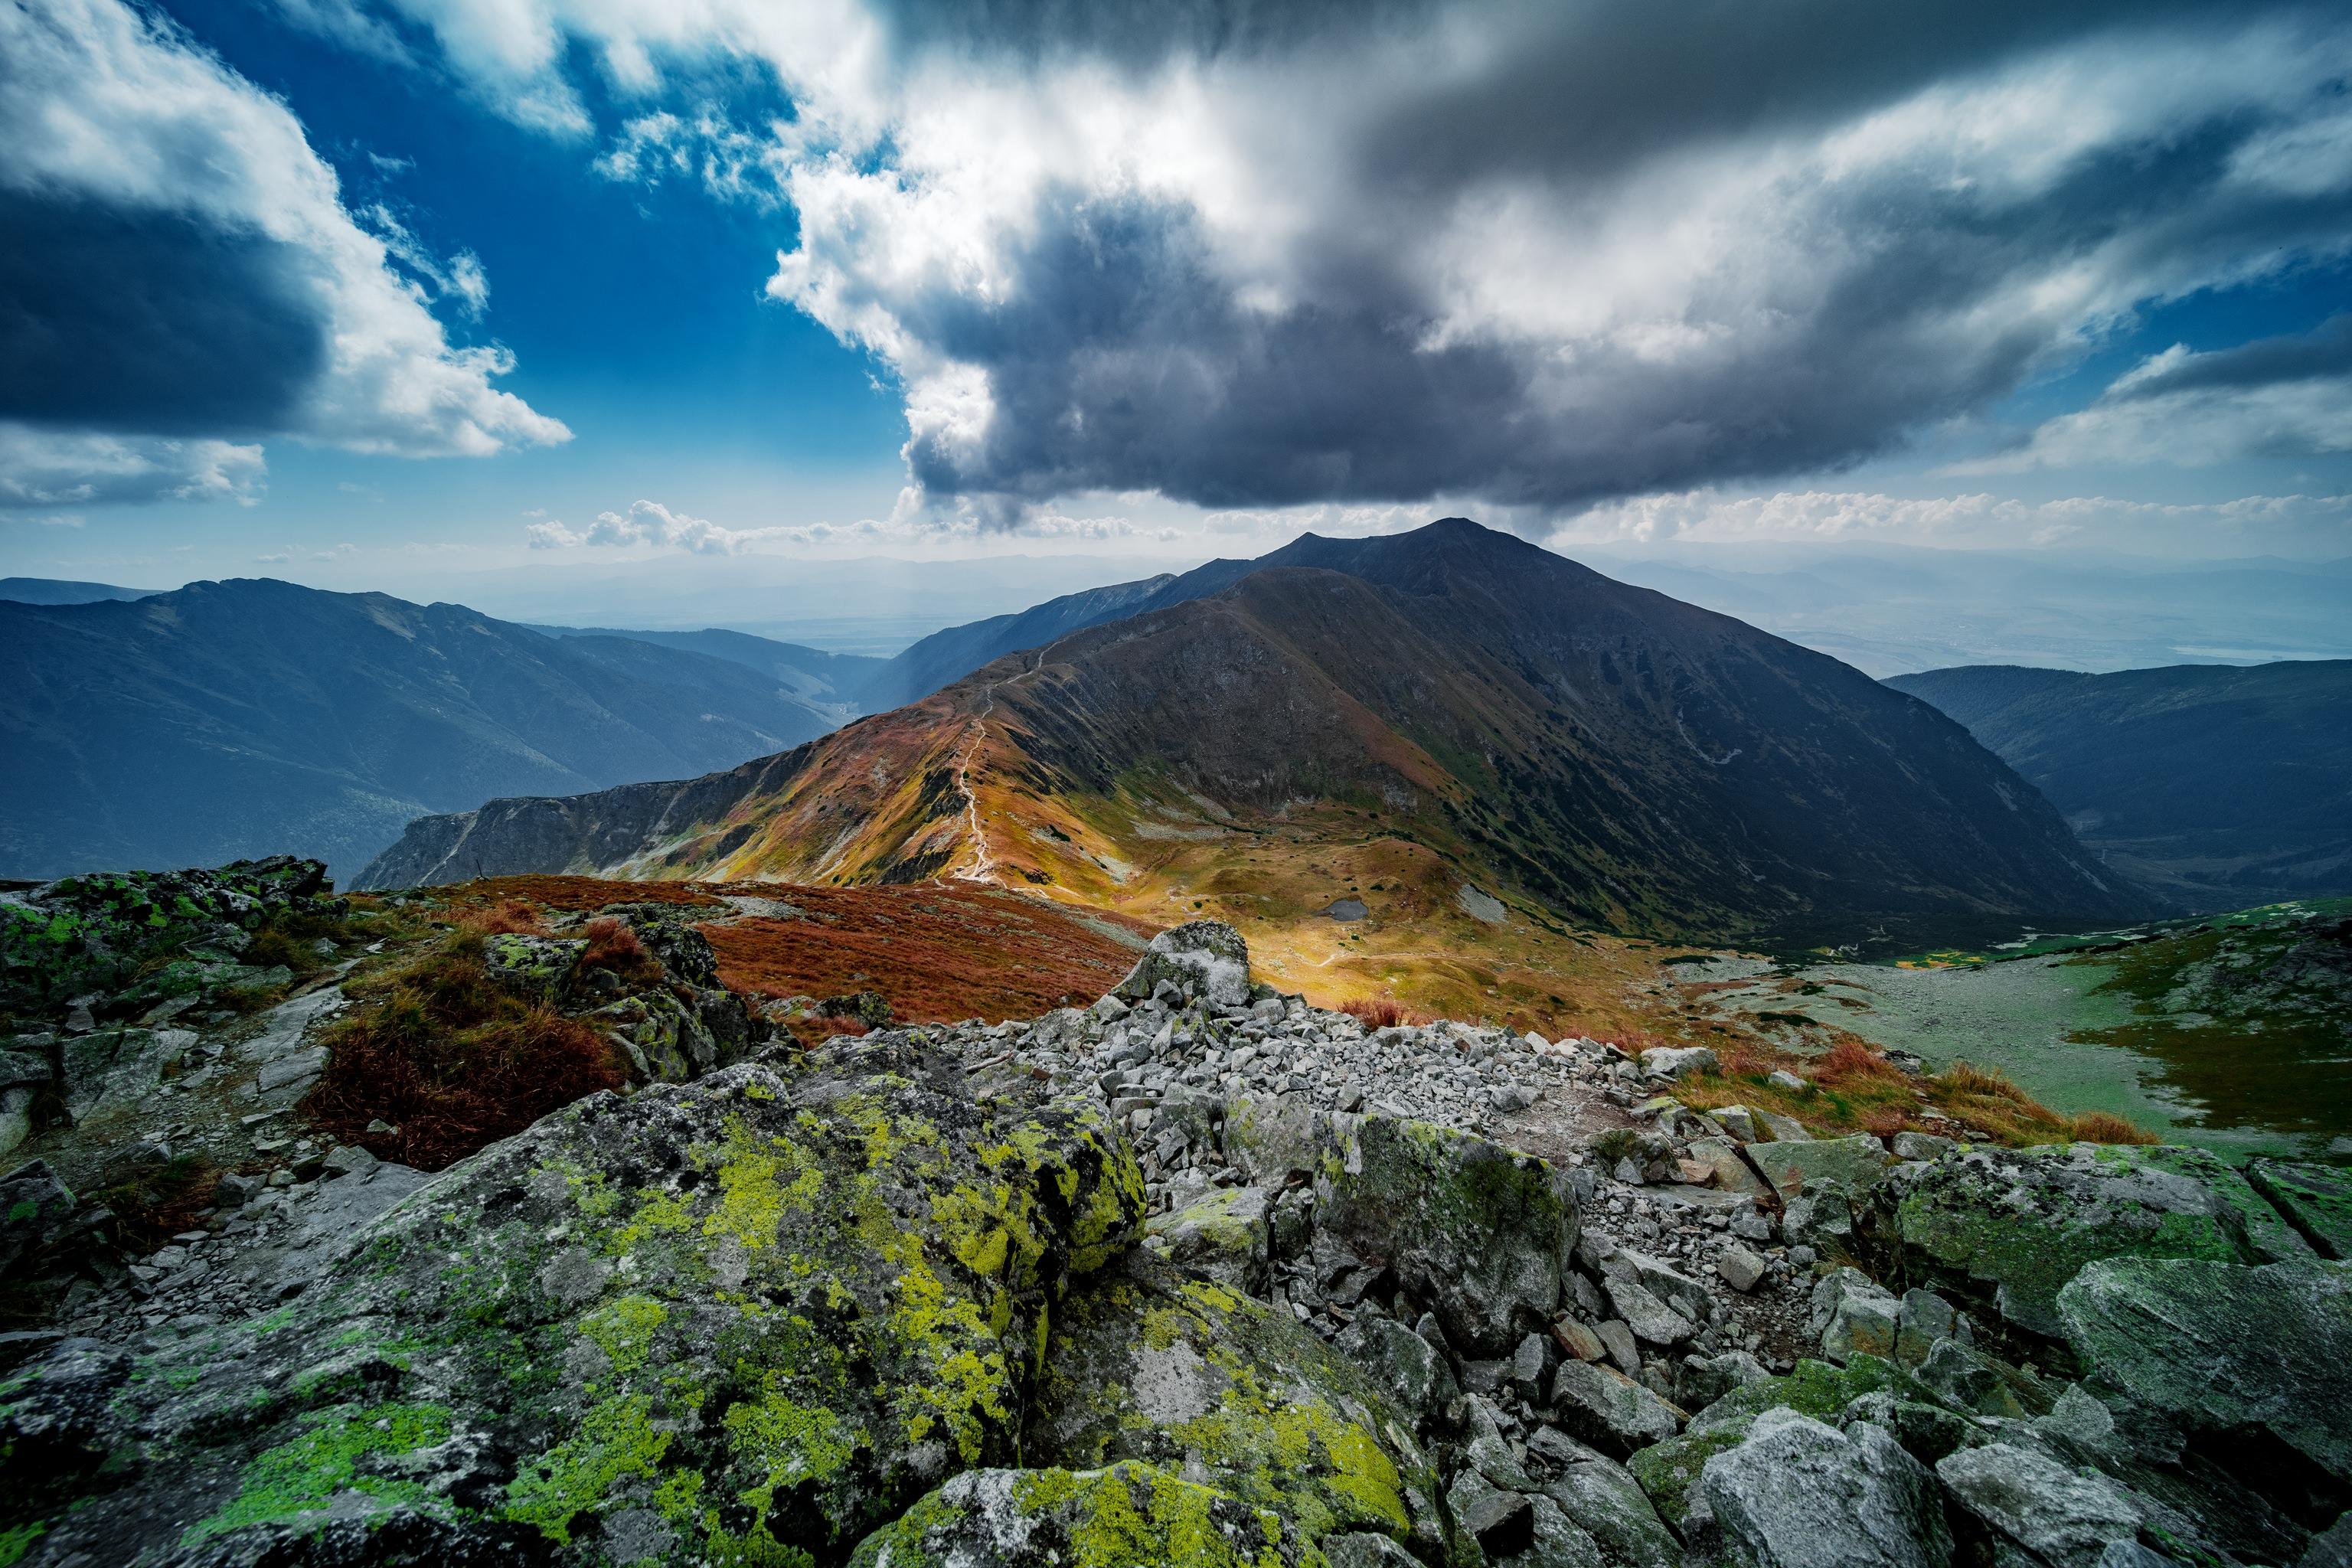 Irix wide landscape